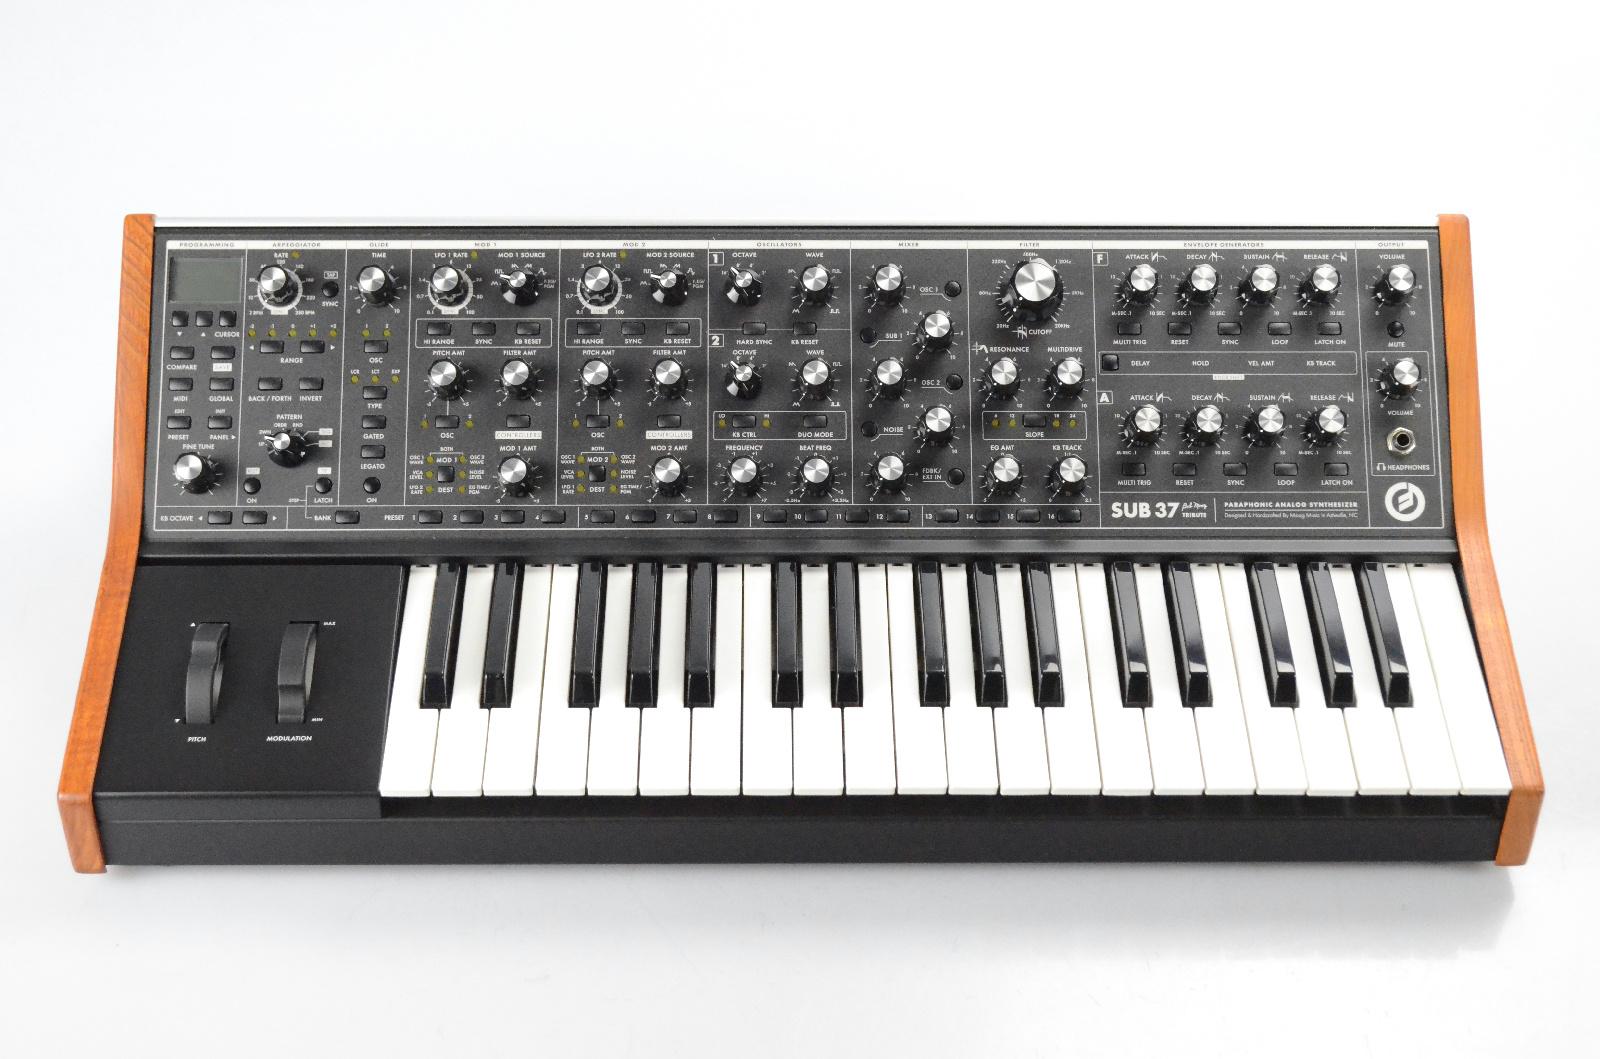 Moog Sub 37 Paraphonic Analog Synthesizer Owned by Justin Meldal-Johnsen #32828